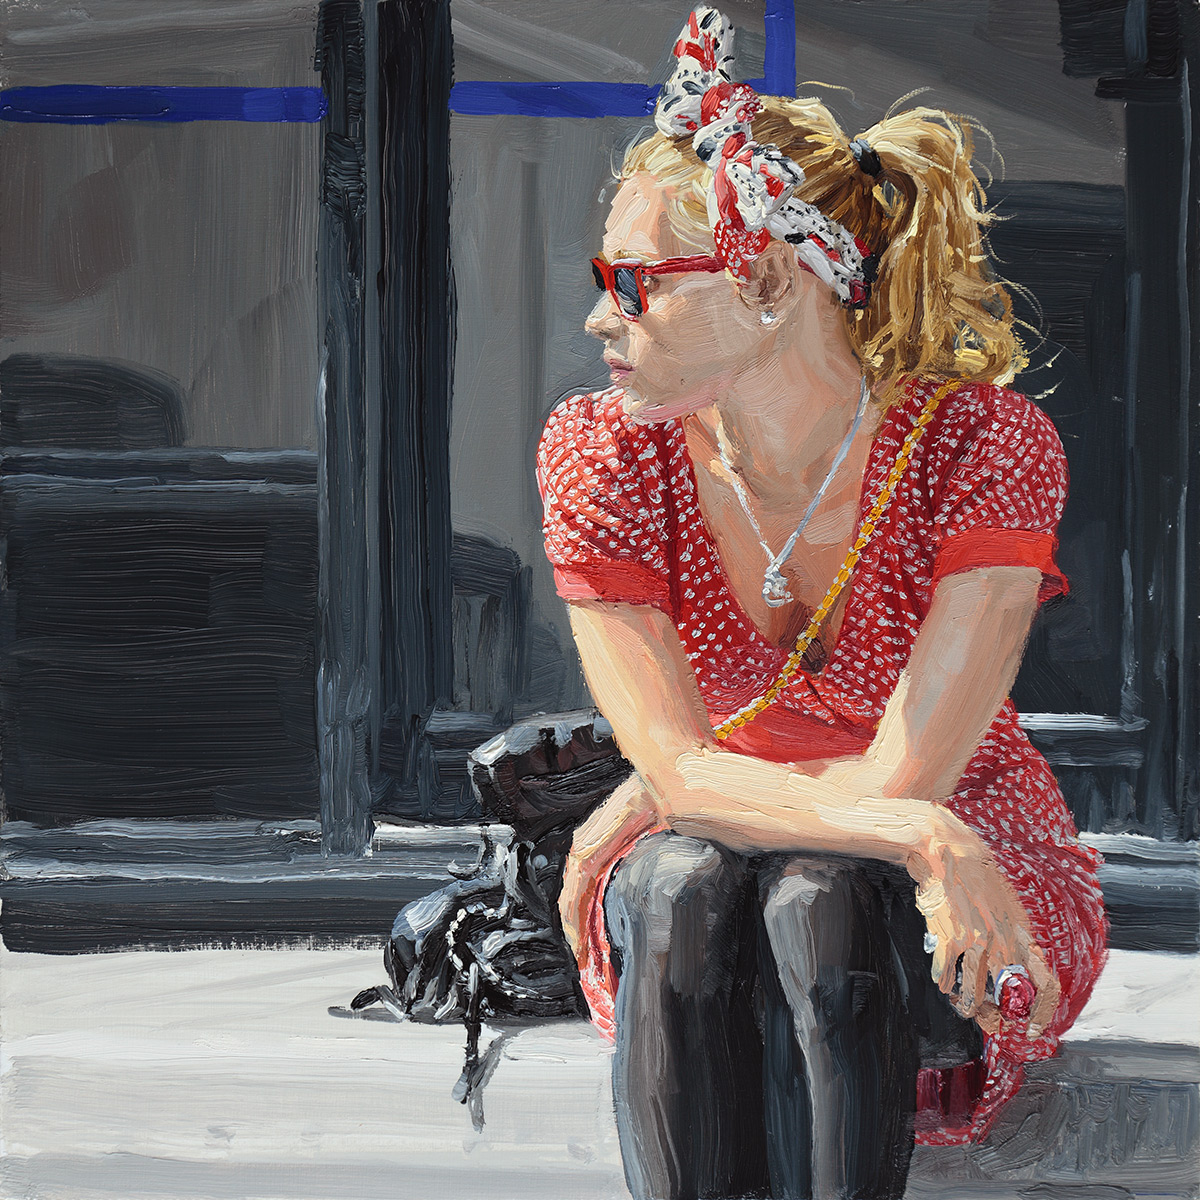 girl-blonde-red-dress-sunglasses-40x40cm.jpg